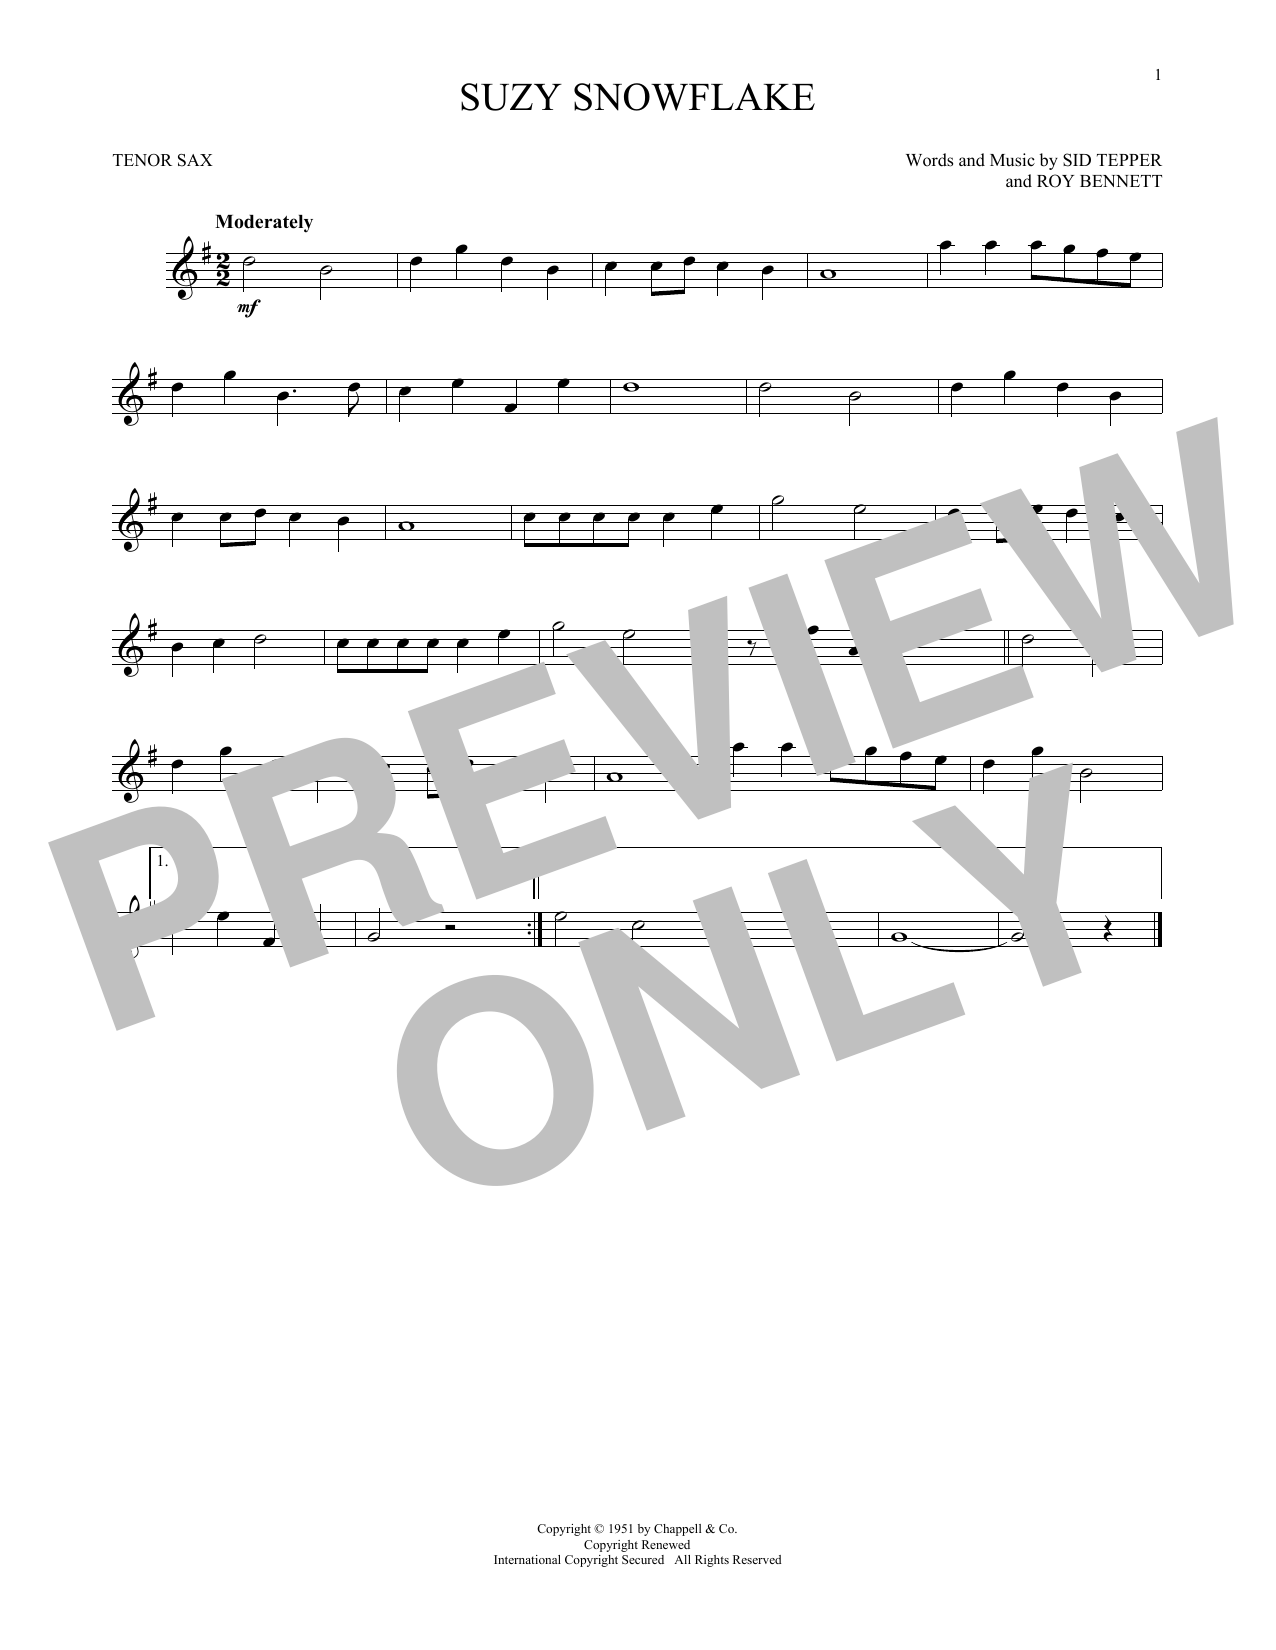 Partition saxophone Suzy Snowflake de Sid Tepper and Roy Bennett - Sax Tenor